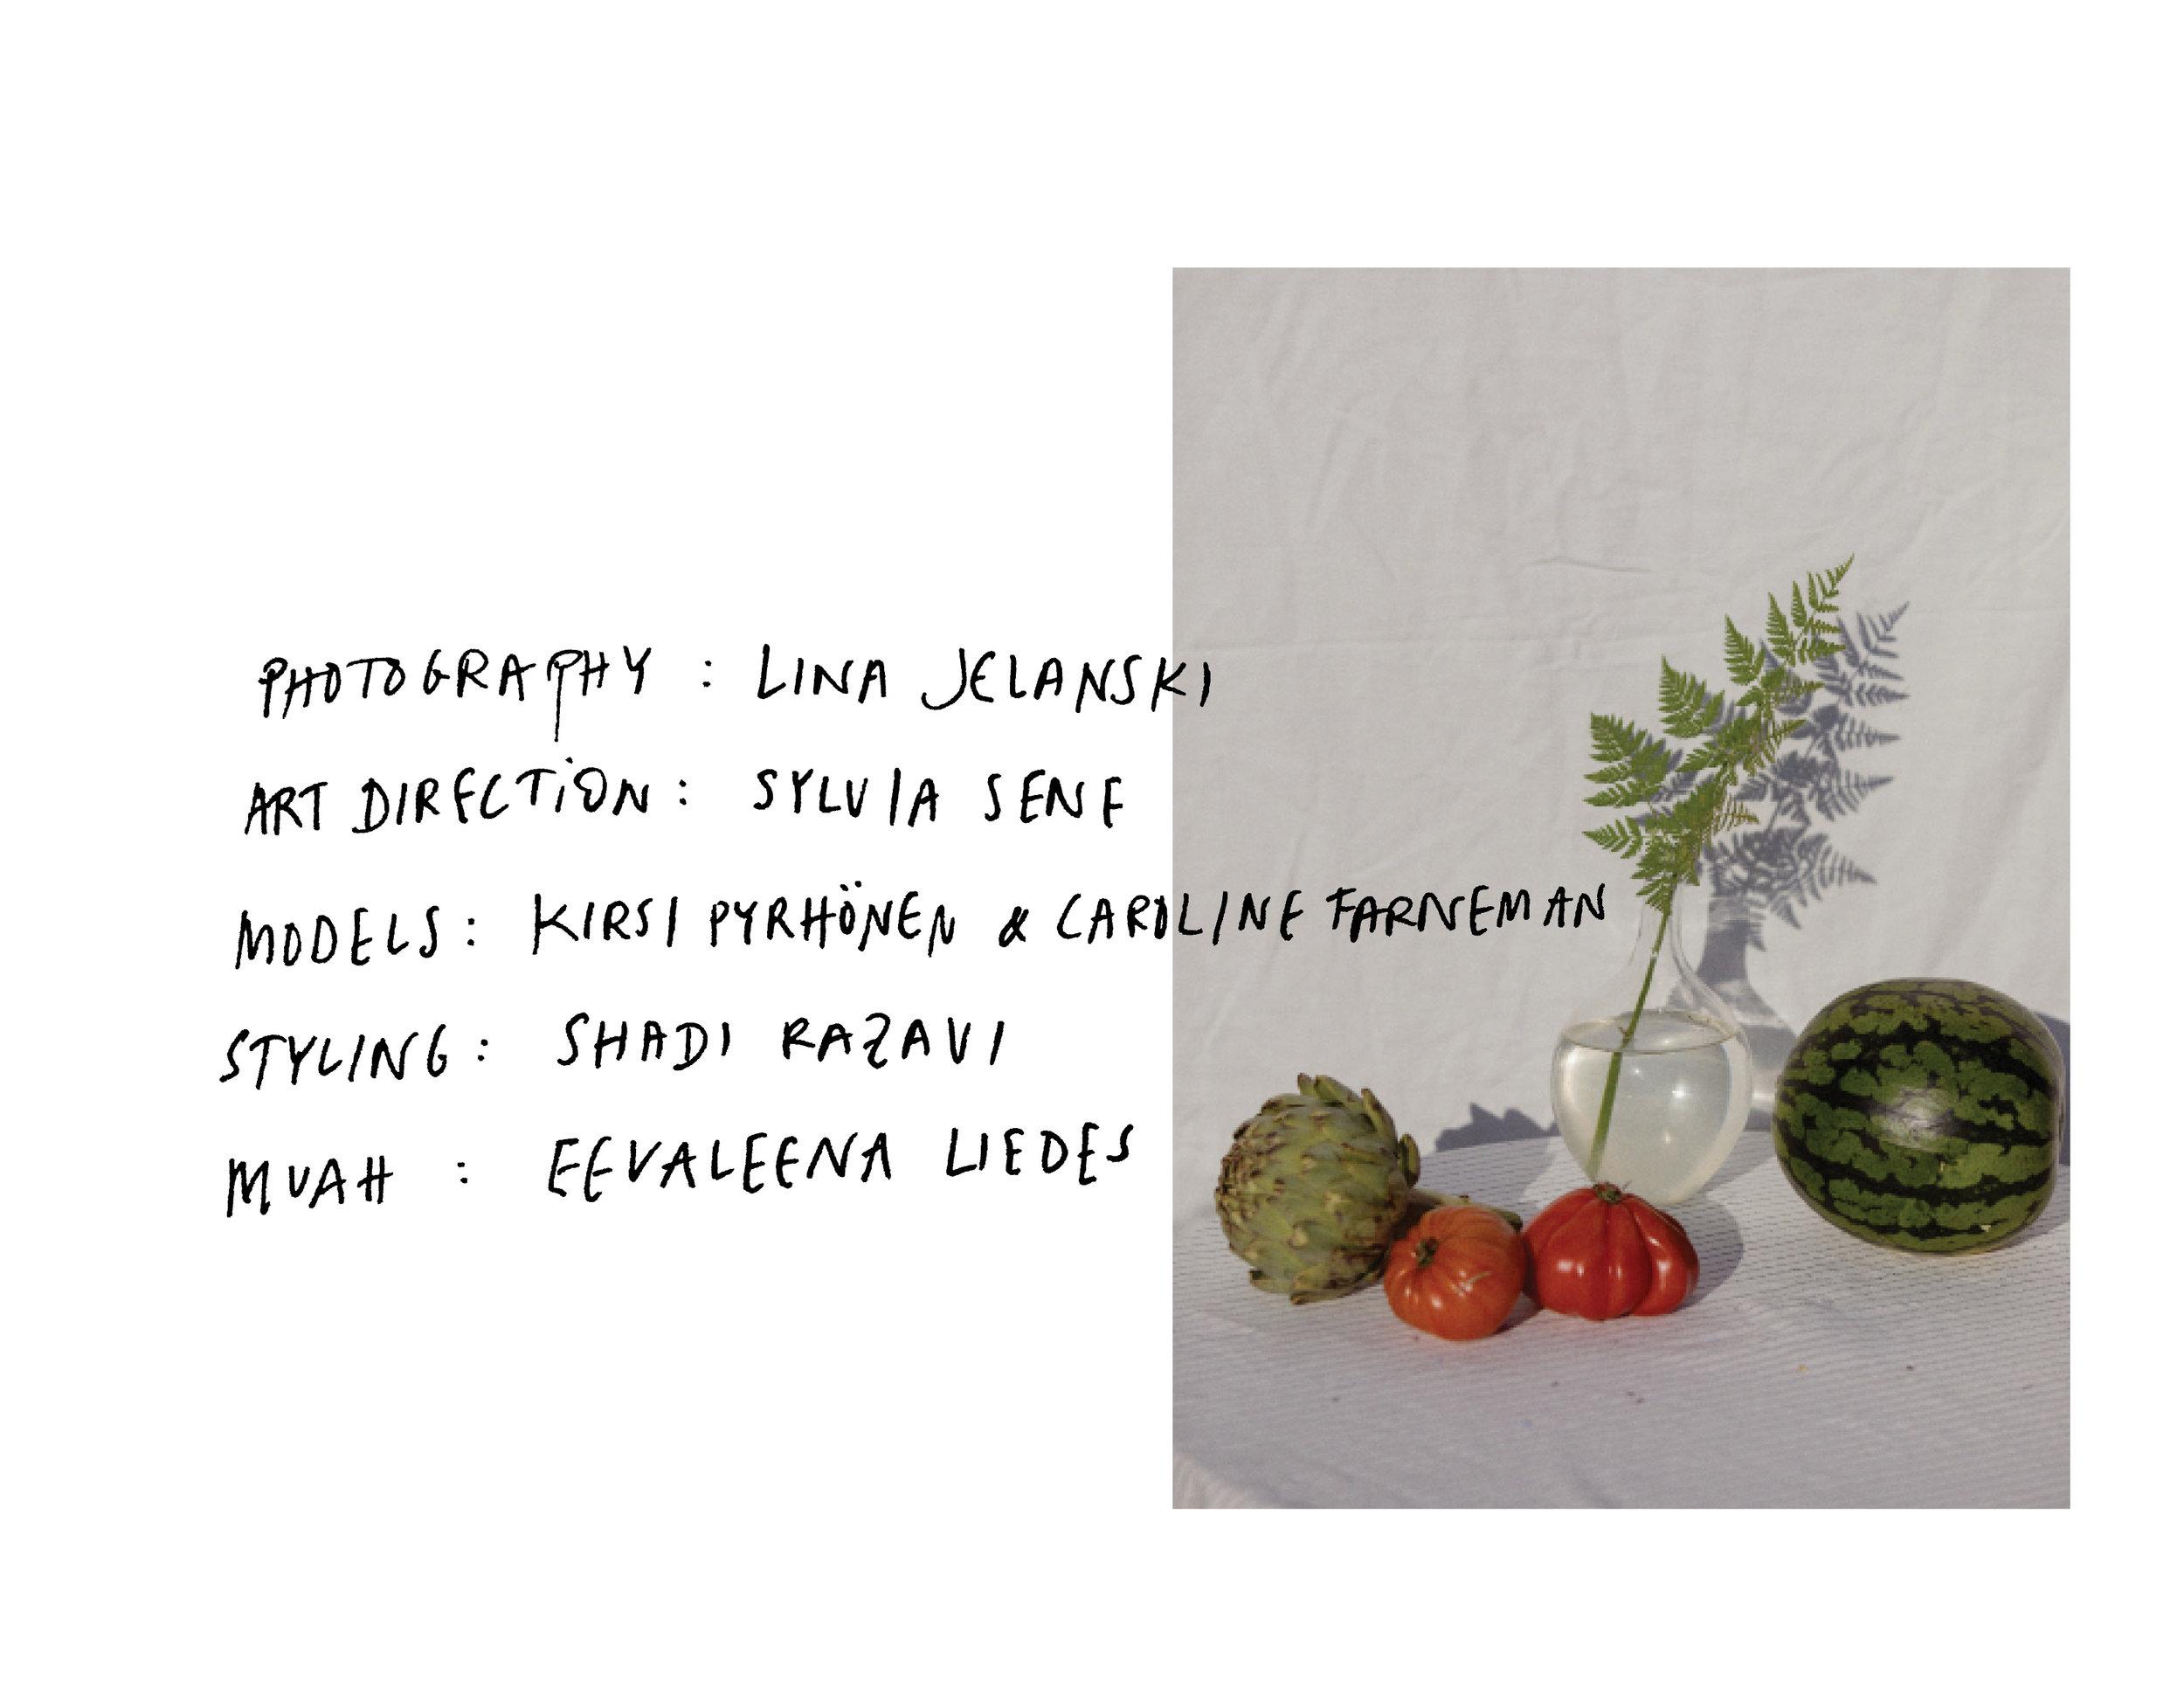 Helsinki_Perfume_Society_Lookbook_highres11.jpg